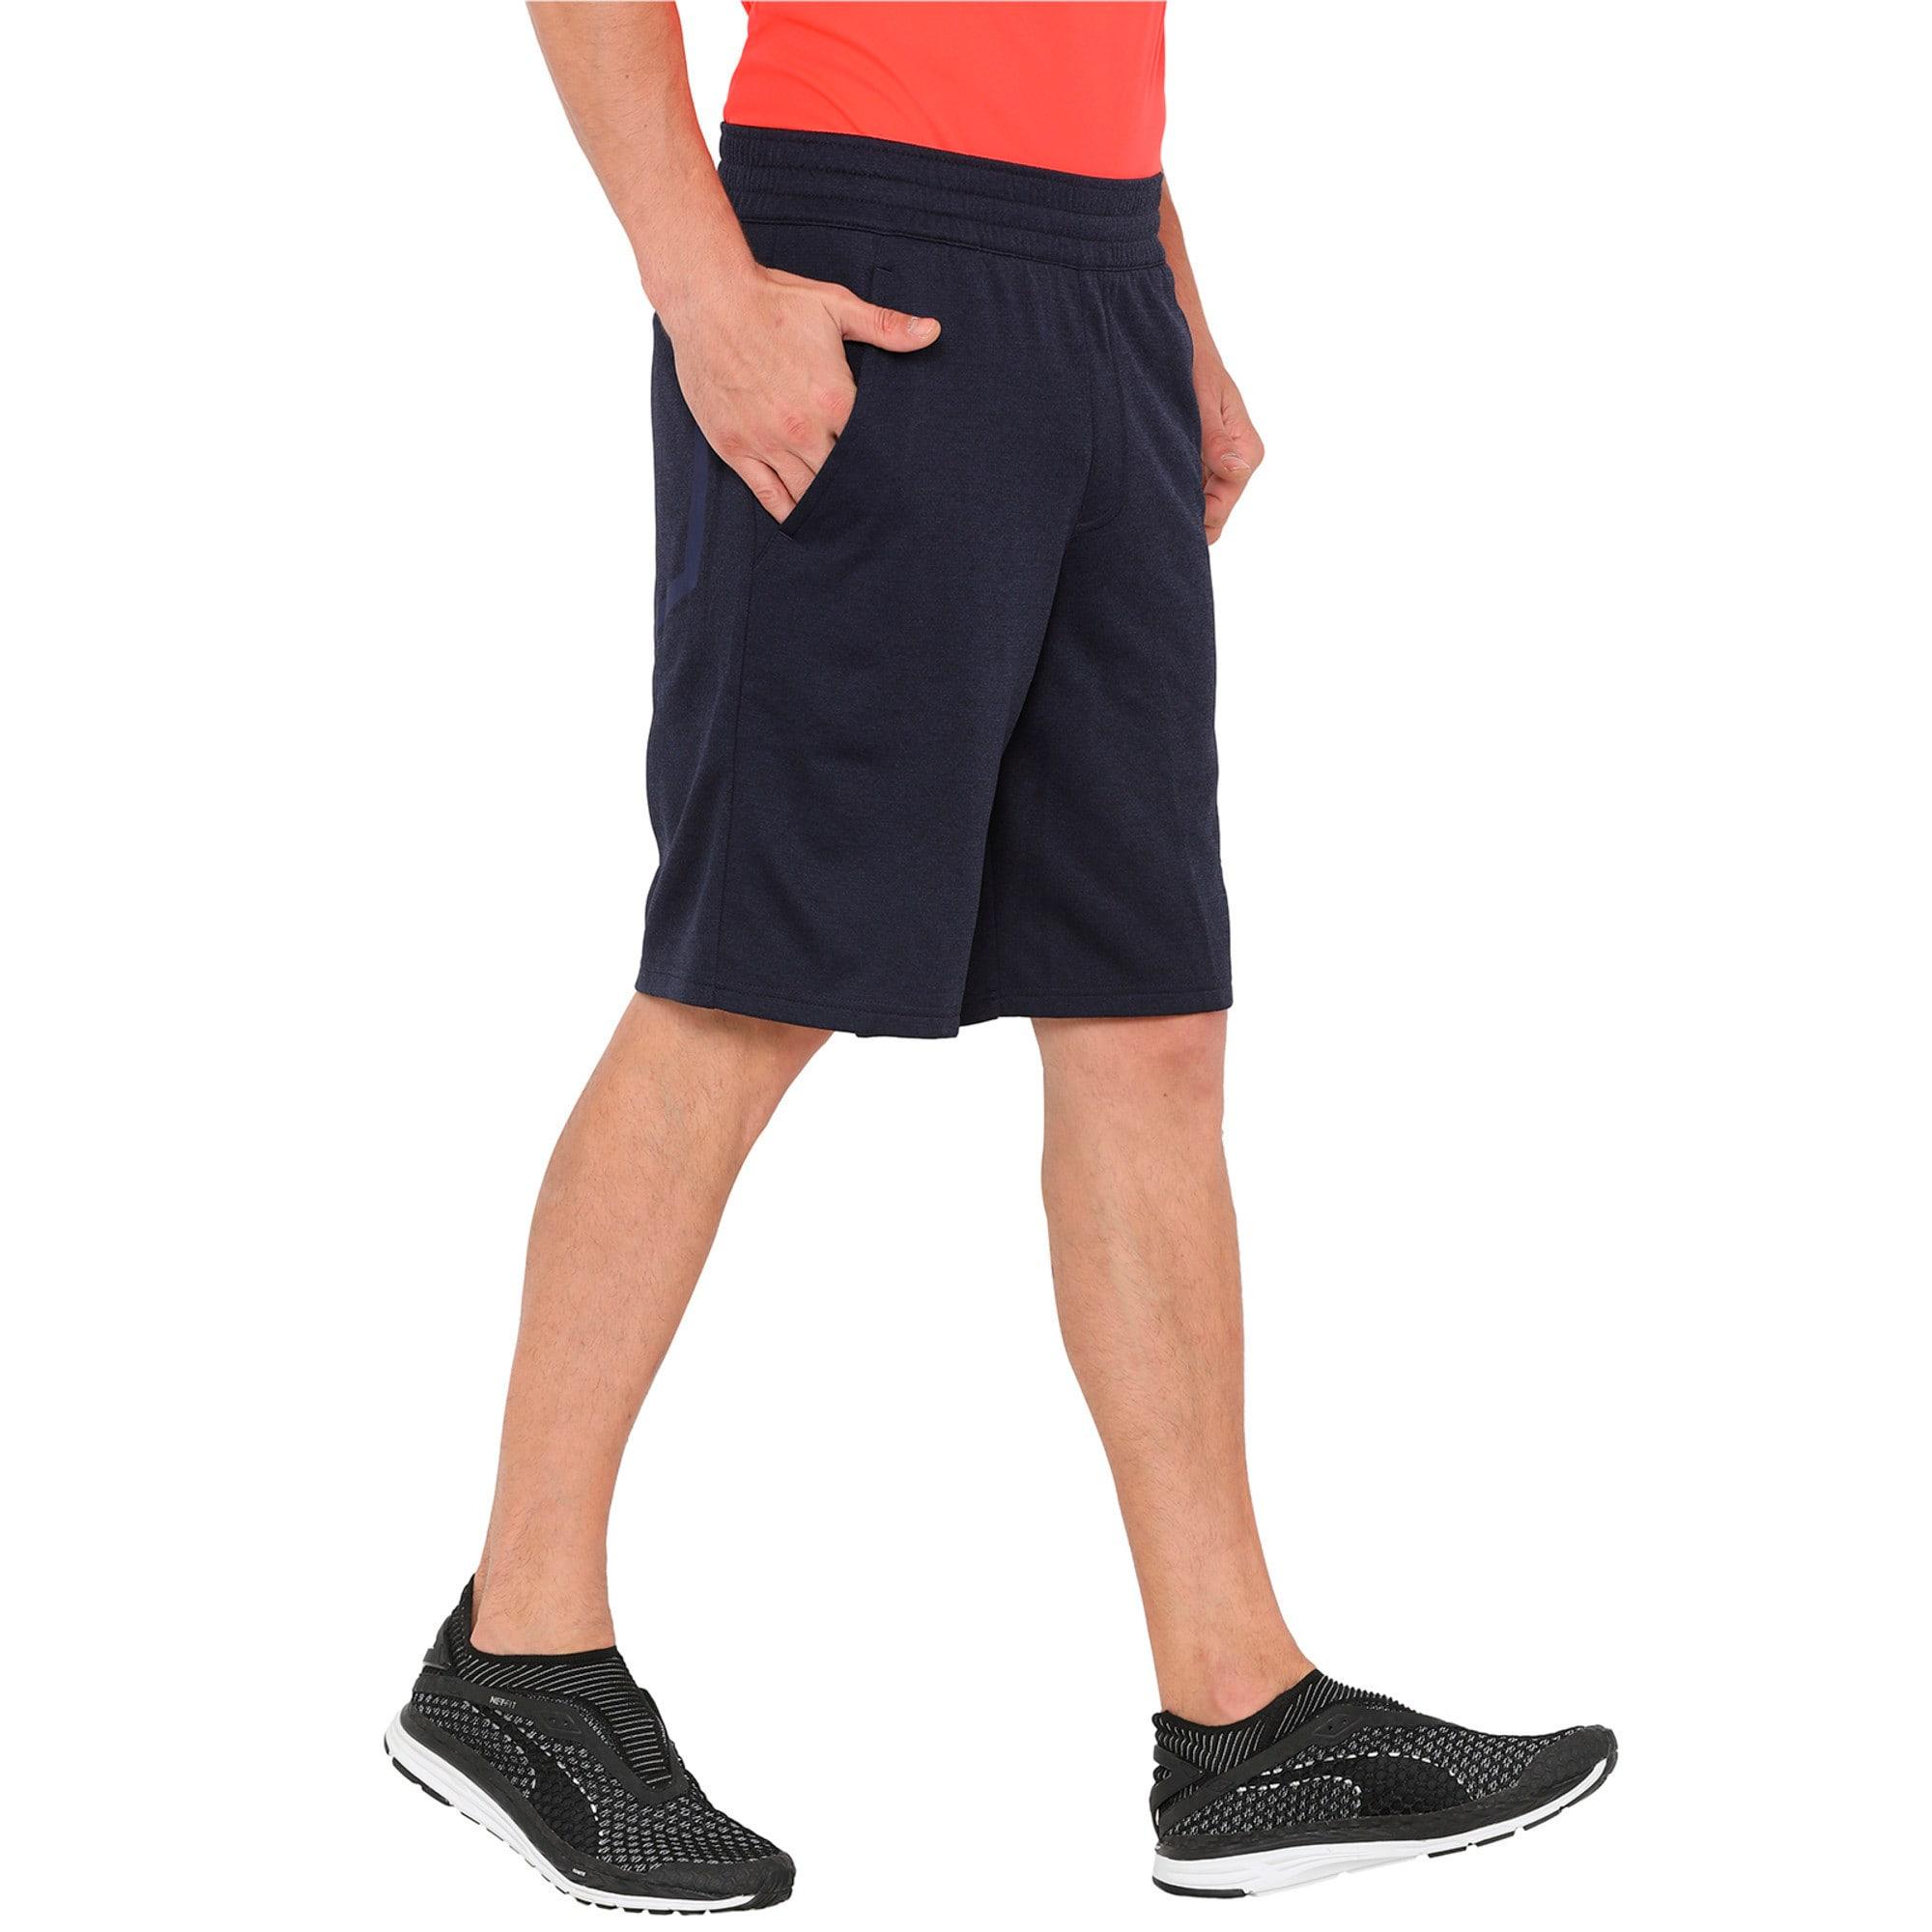 Thumbnail 2 of Oceanaire Energy Men's Shorts, Peacoat Heather, medium-IND